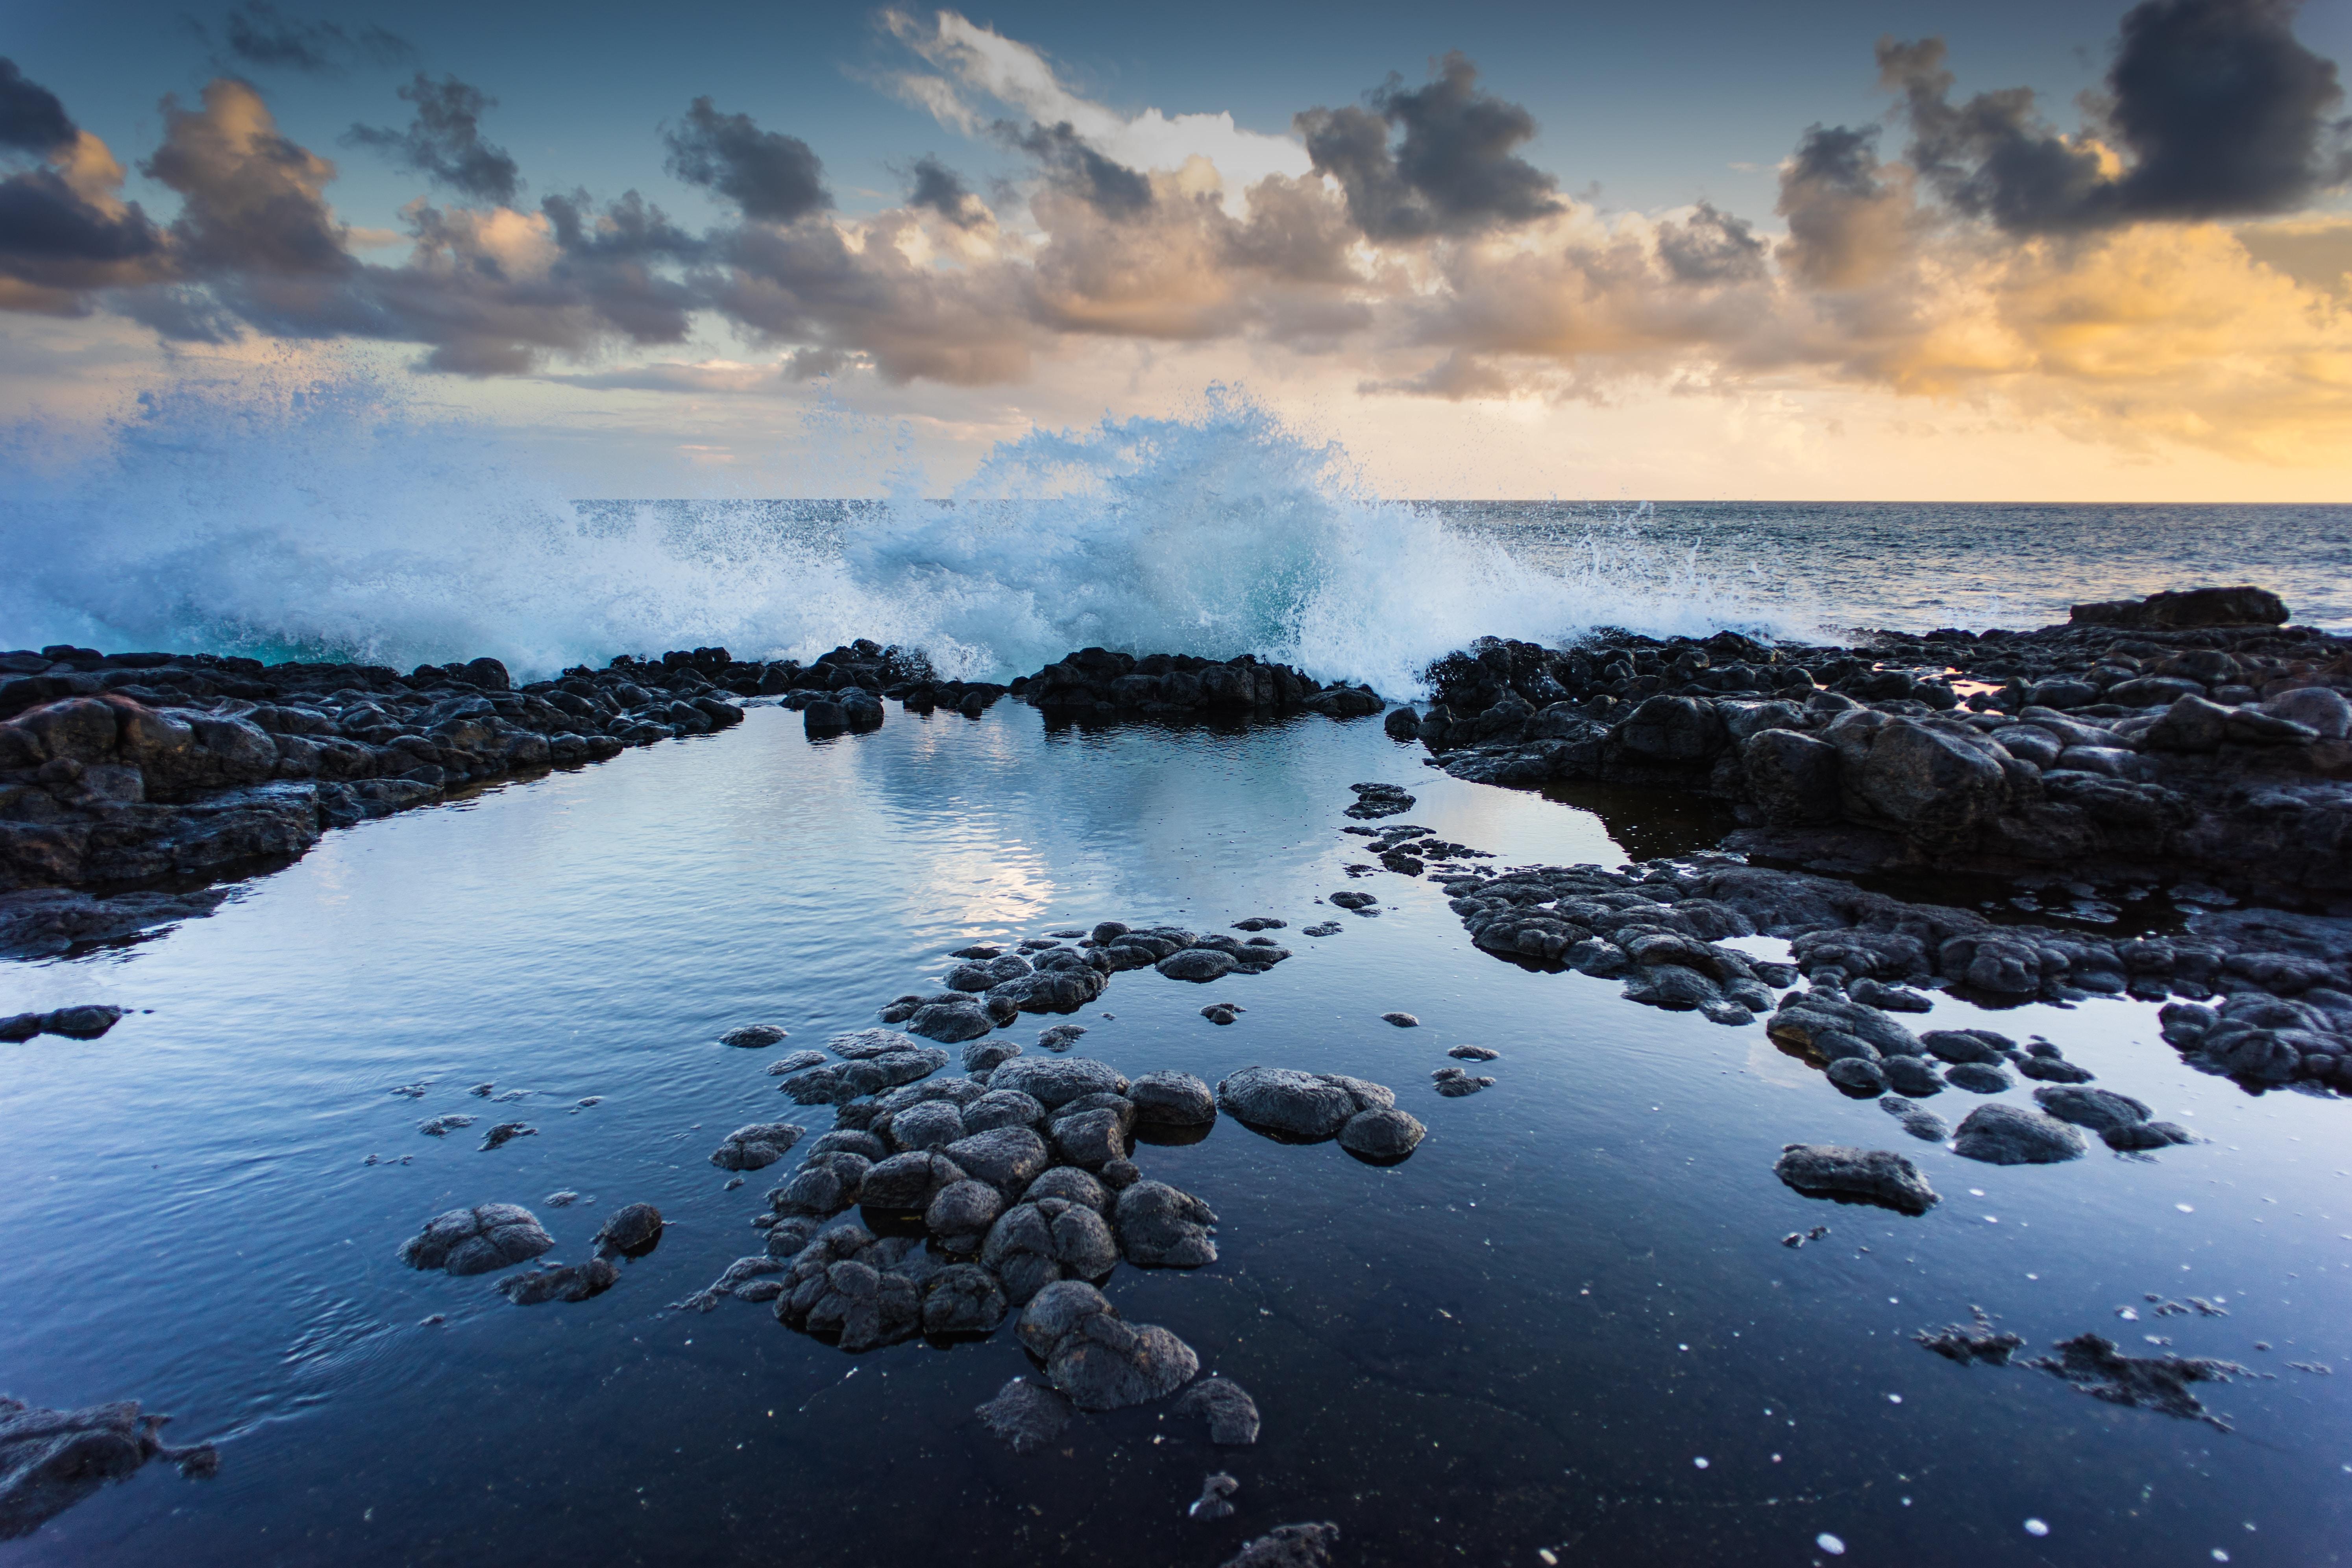 landscape photography of rocks and barrel wave